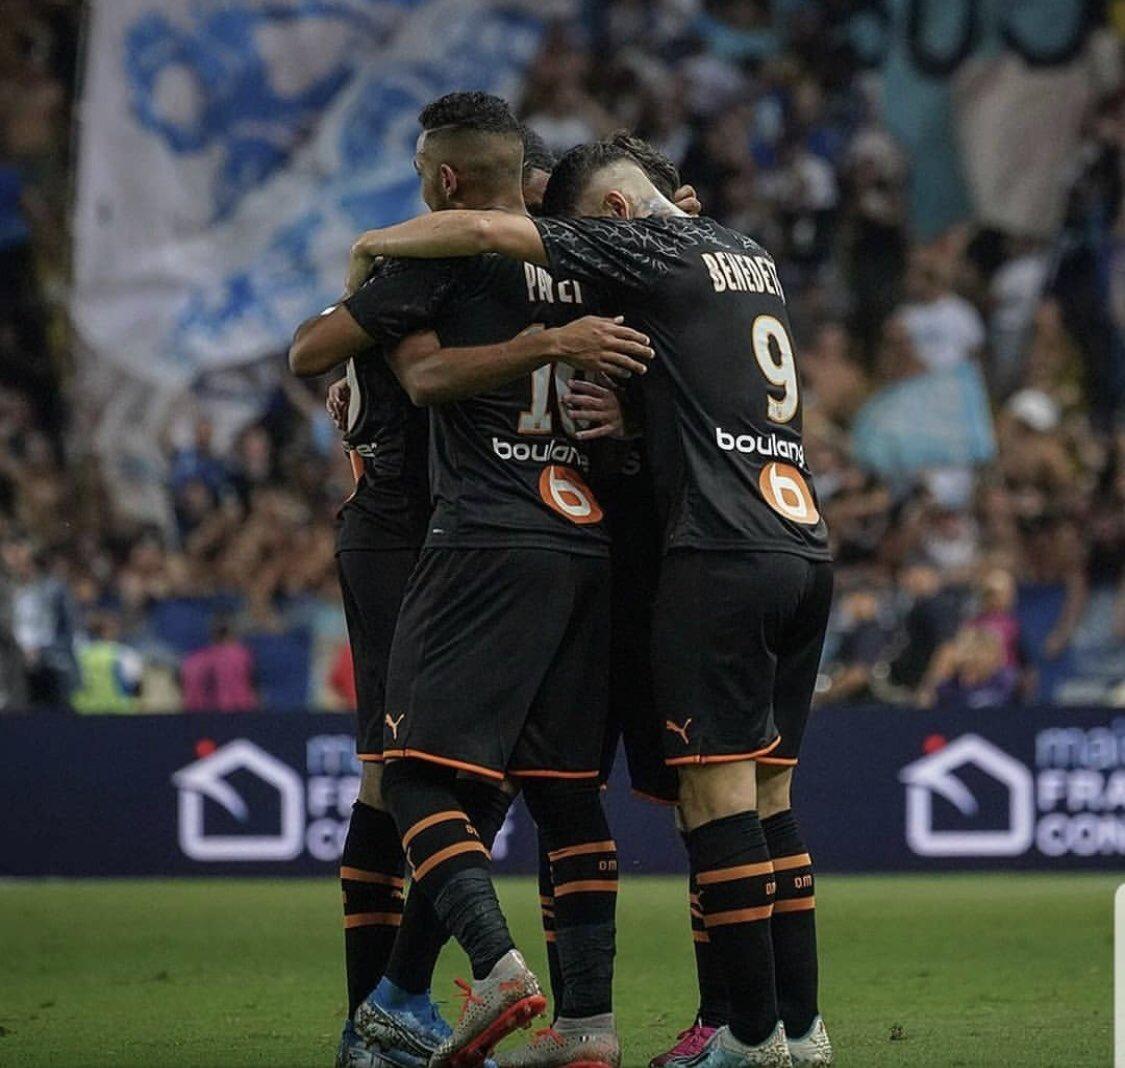 RT @hi04ro30ki: Bravo l'équipe 👏👏  自分は早く治します! #TeamOM #3連勝 https://t.co/u1xUh1ujav